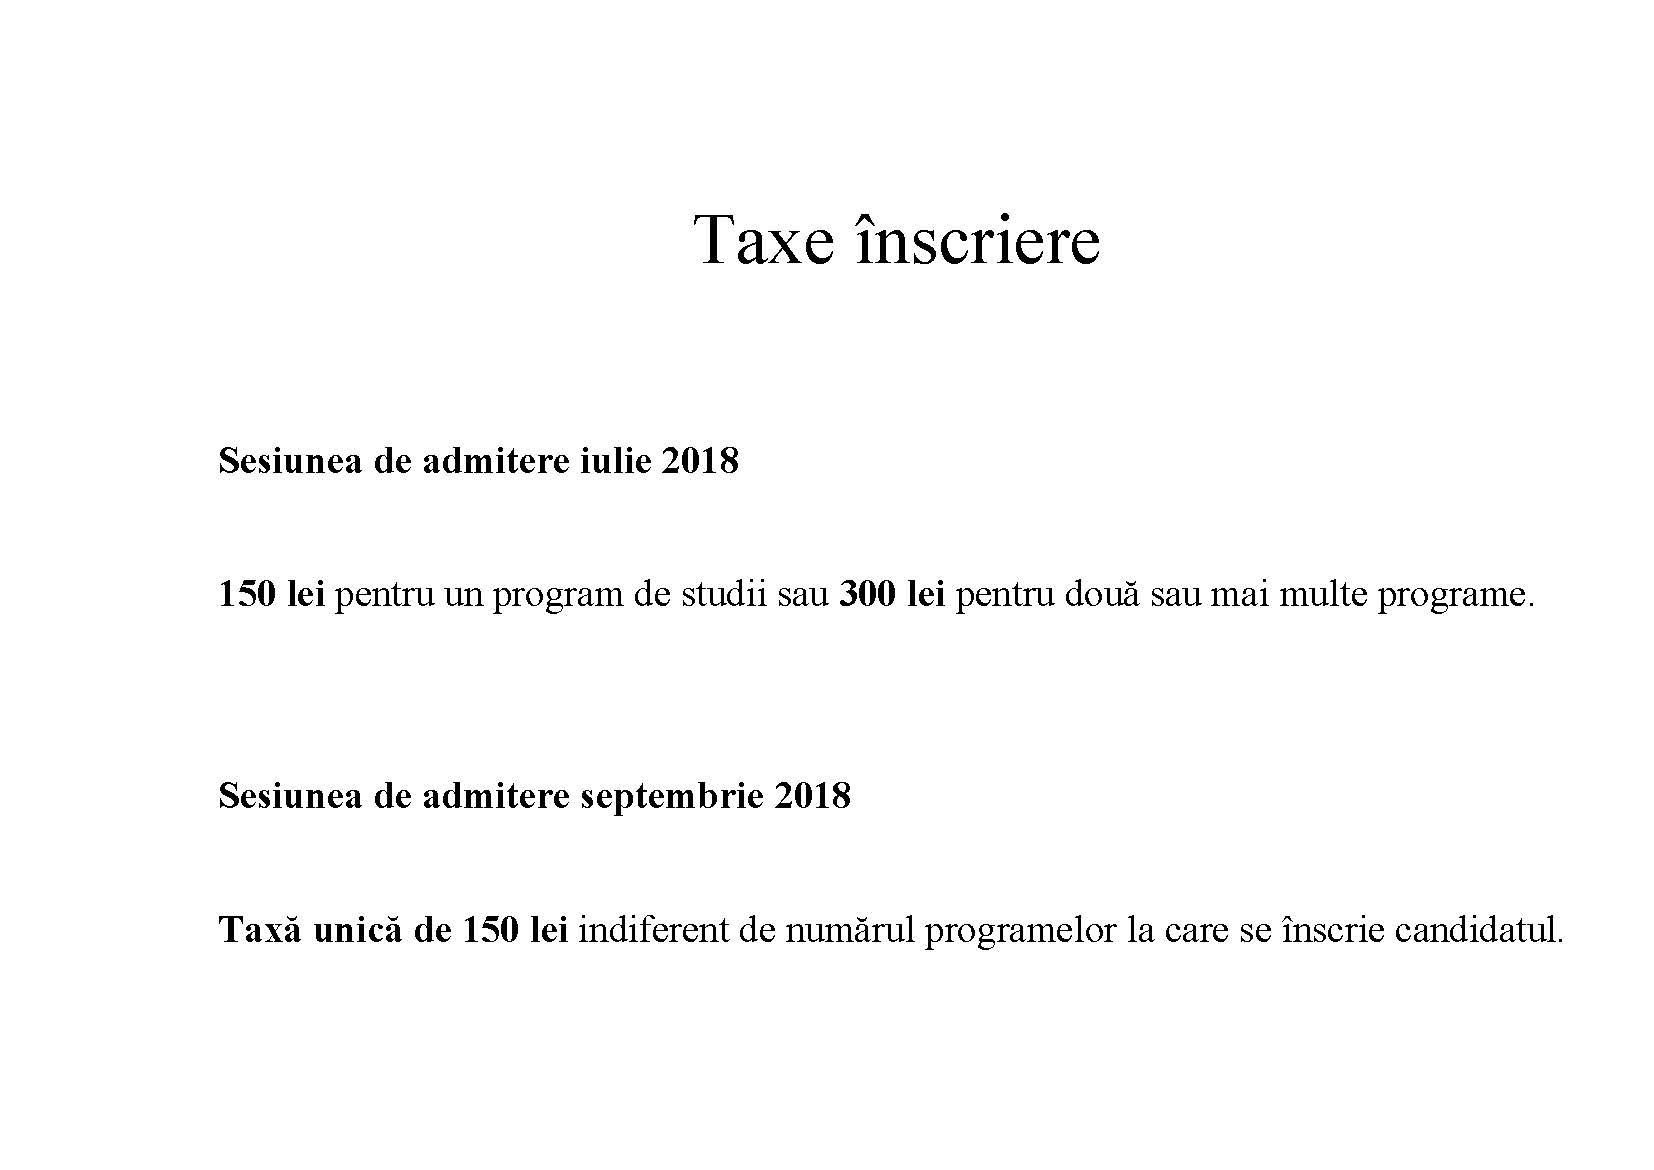 Taxe înscriere